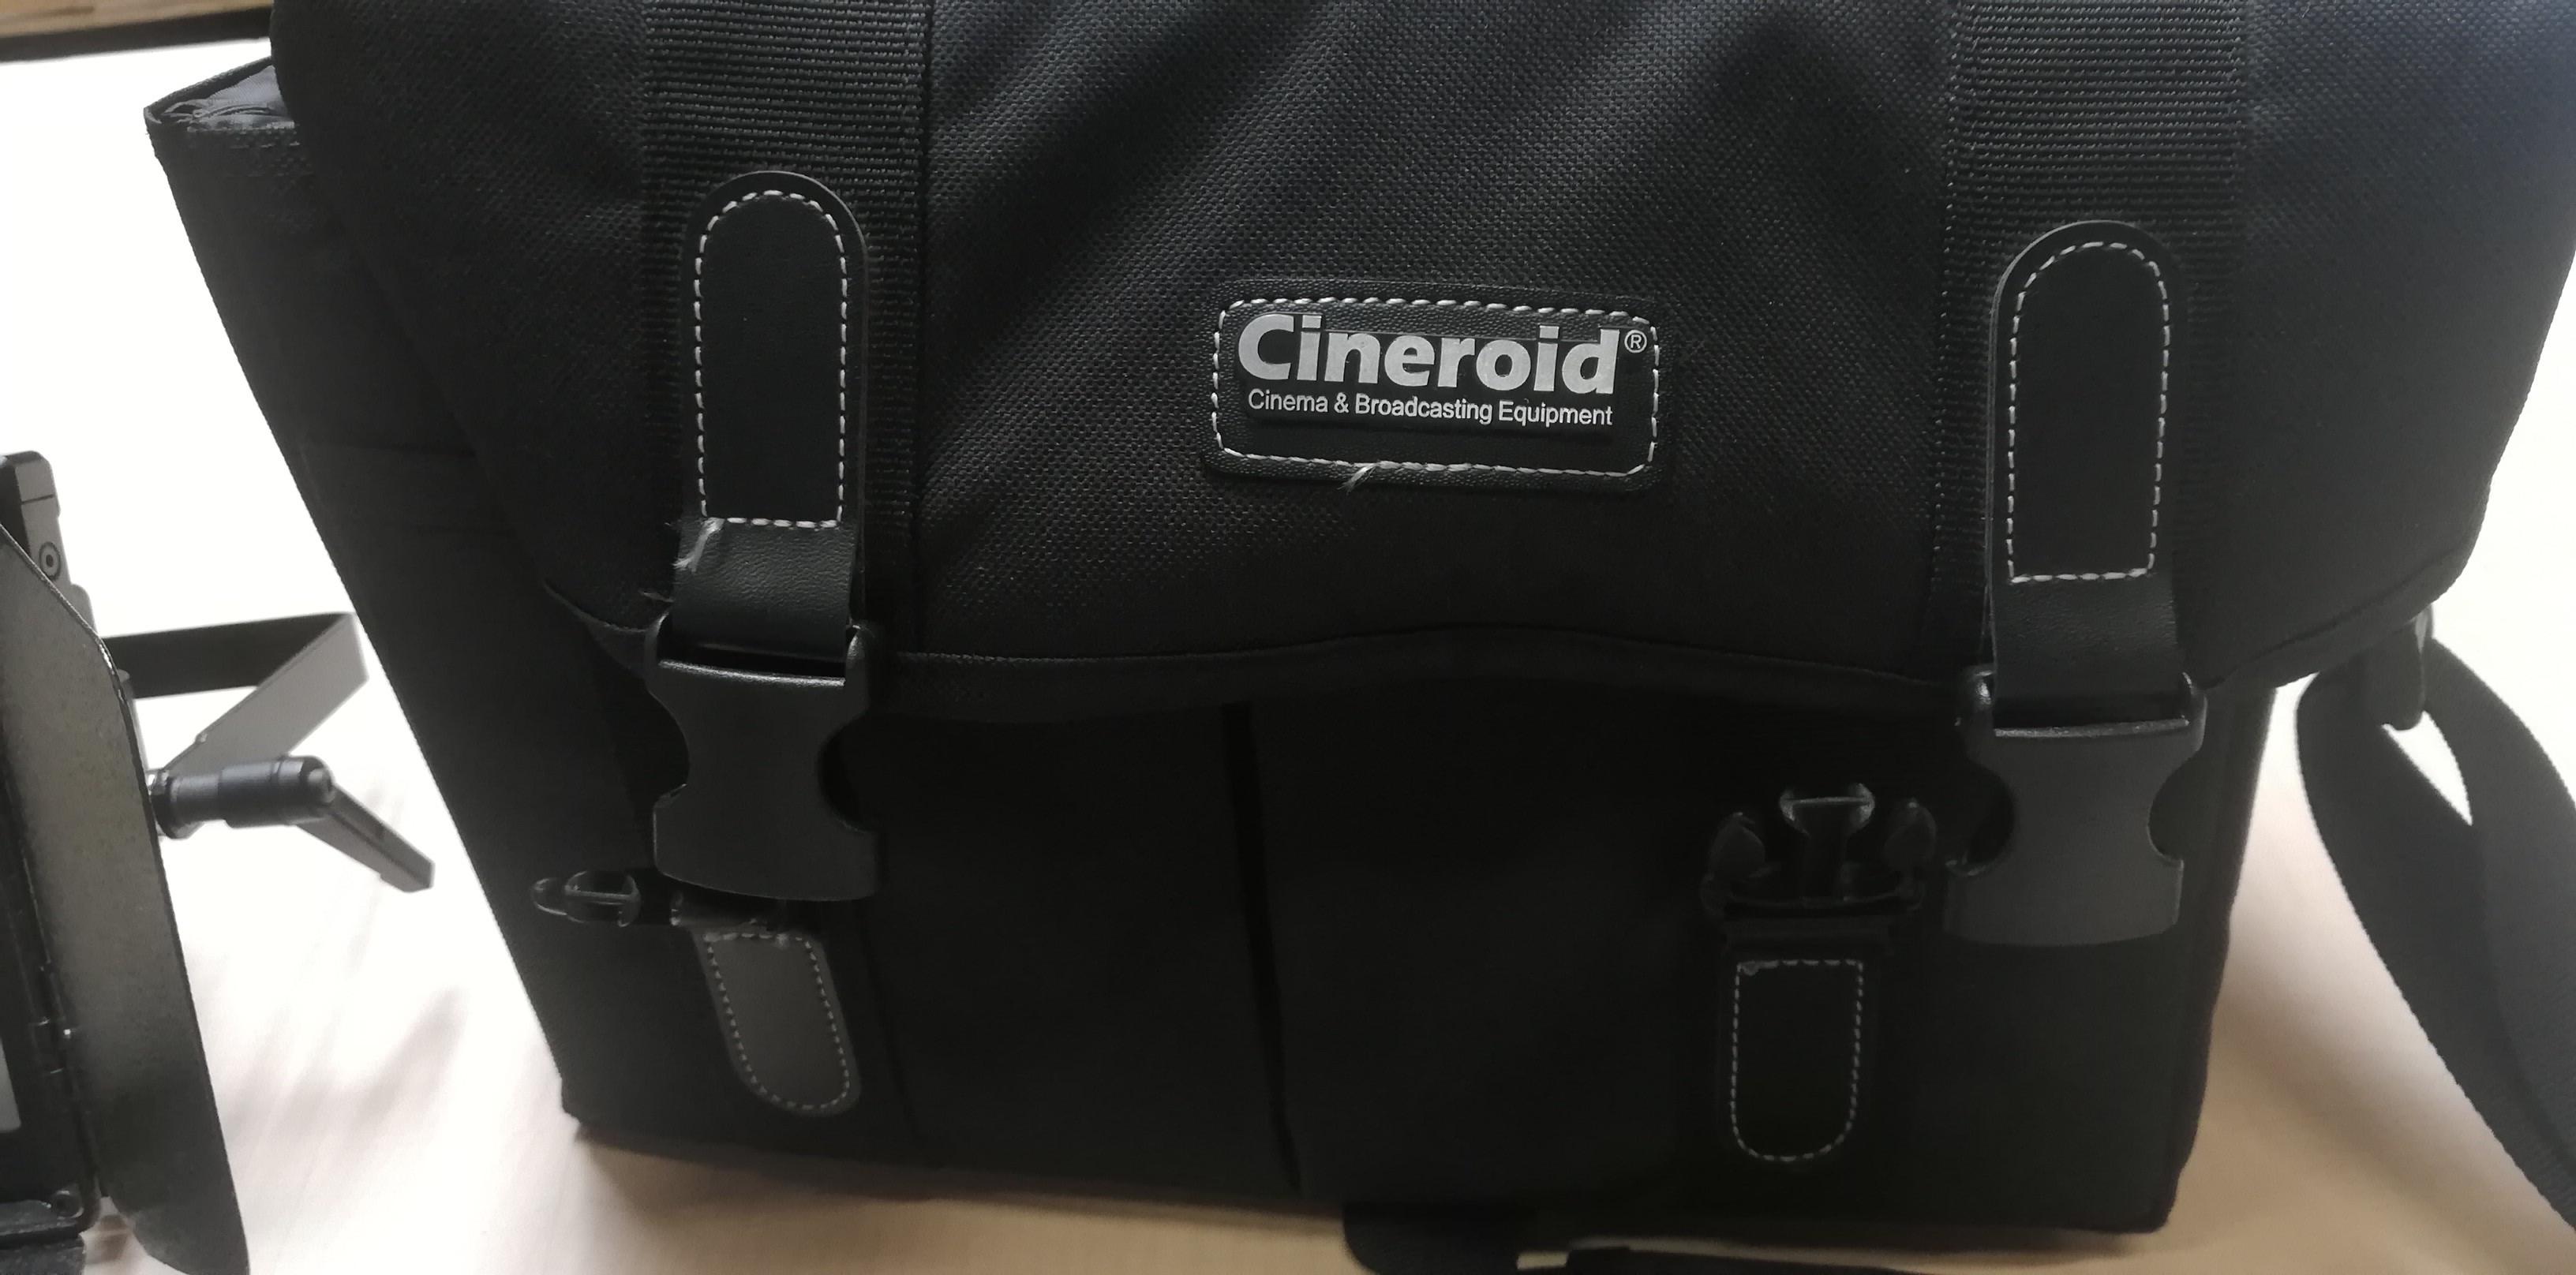 CINEROID LM 400